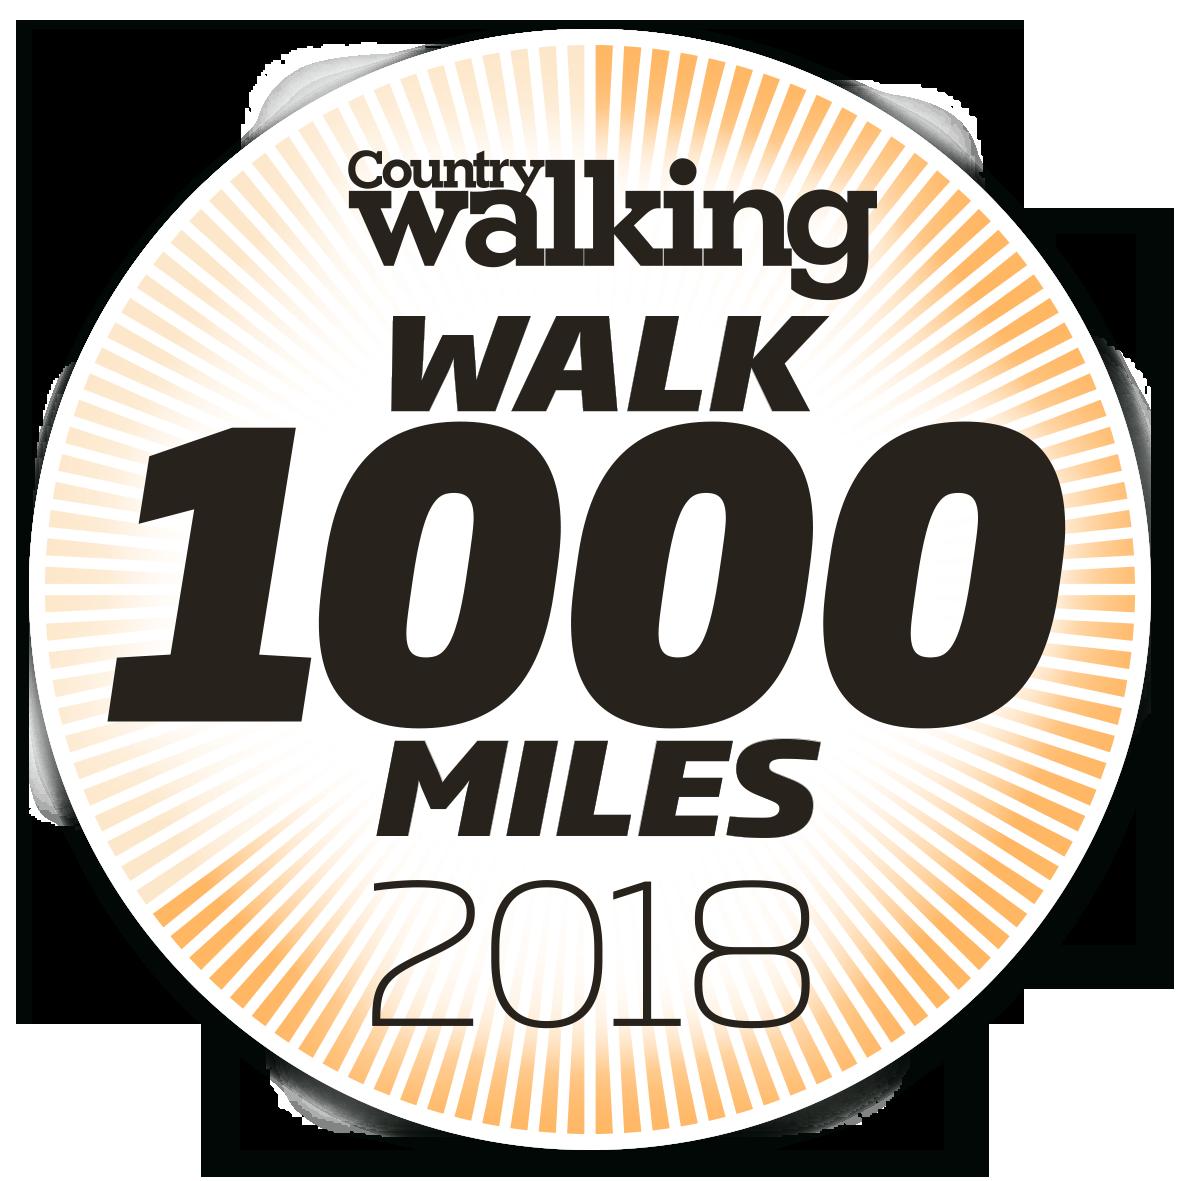 Walk 1000 Miles